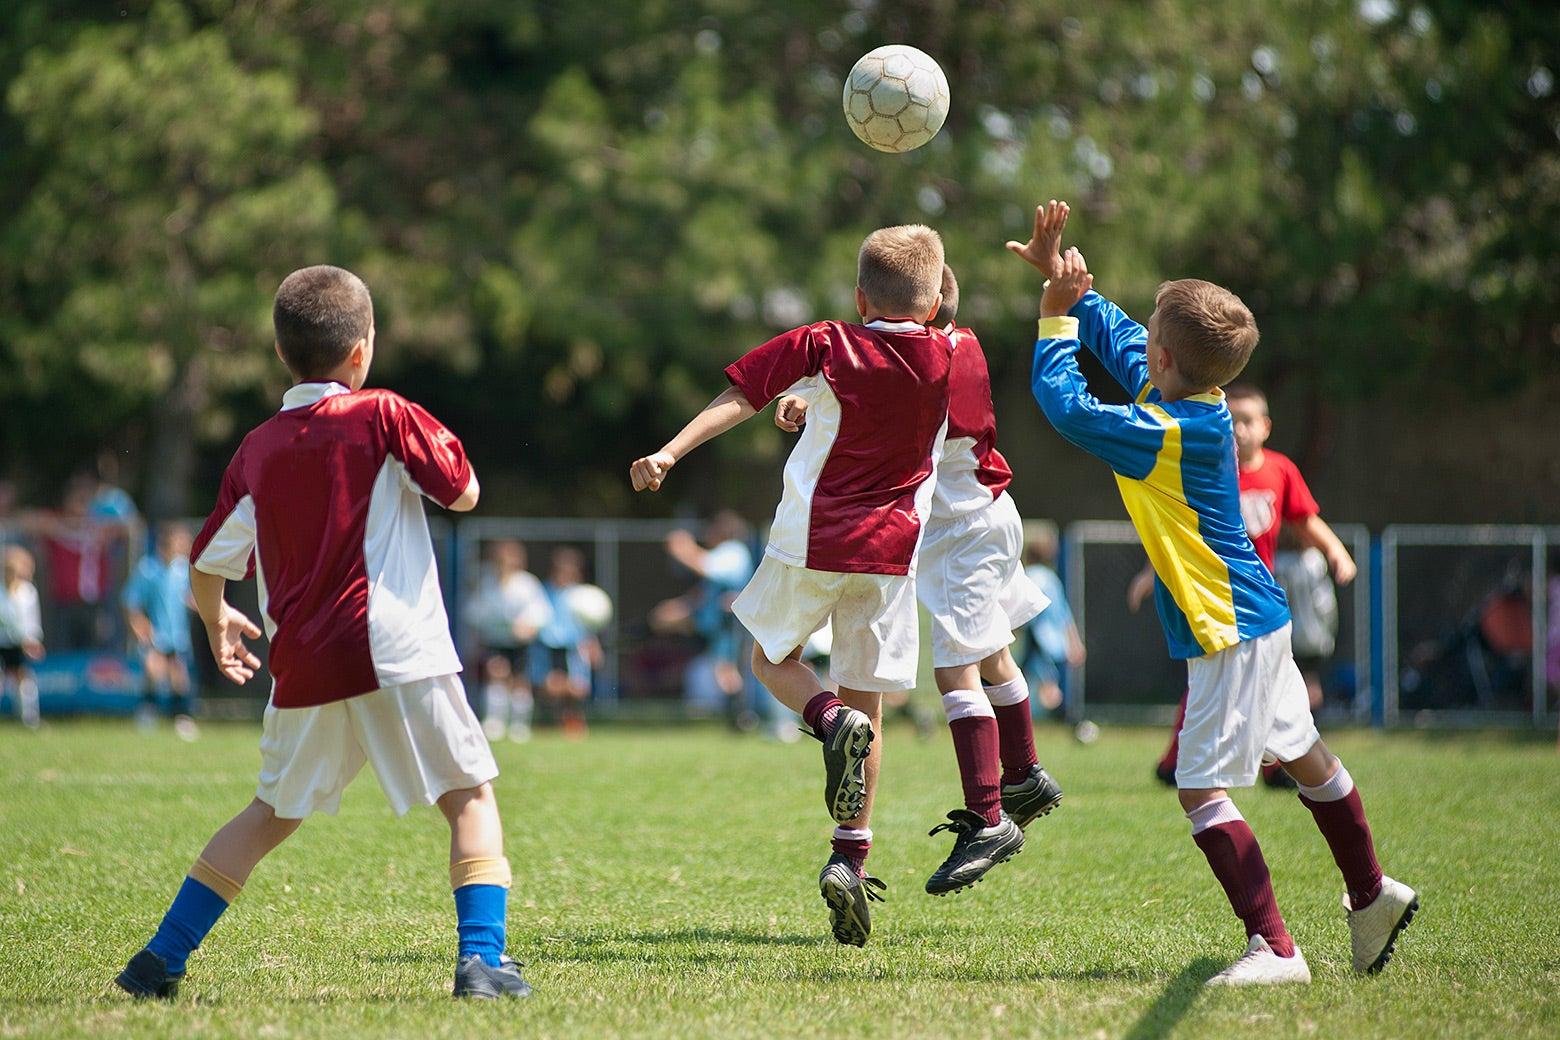 Boys playing organized soccer on a field.